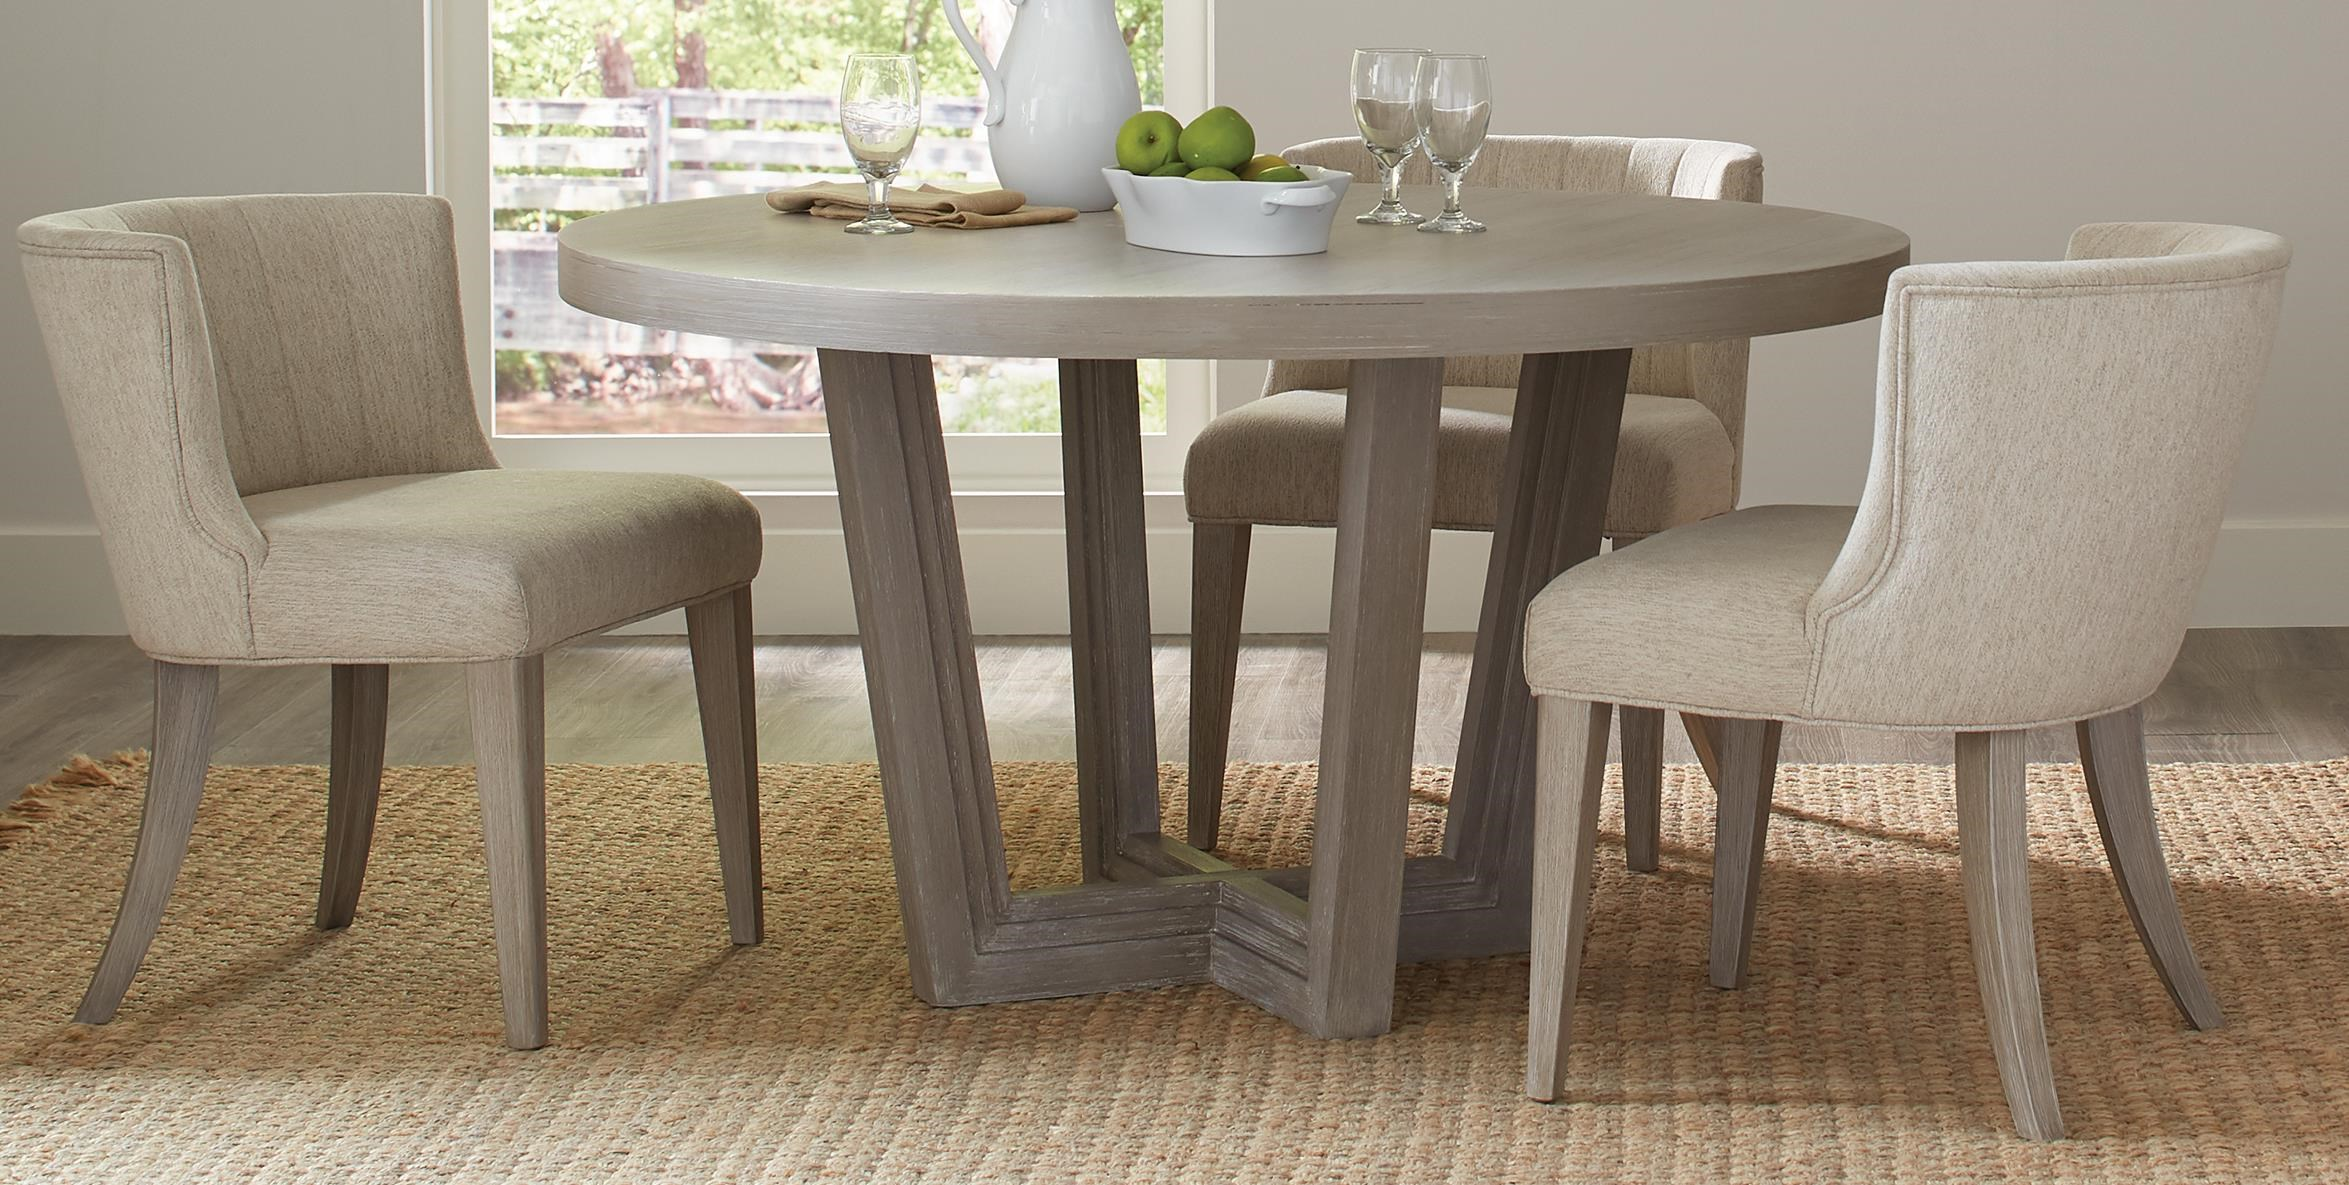 Cassandra Cassandra 5-Piece Table Set by Riverside Furniture at Morris Home